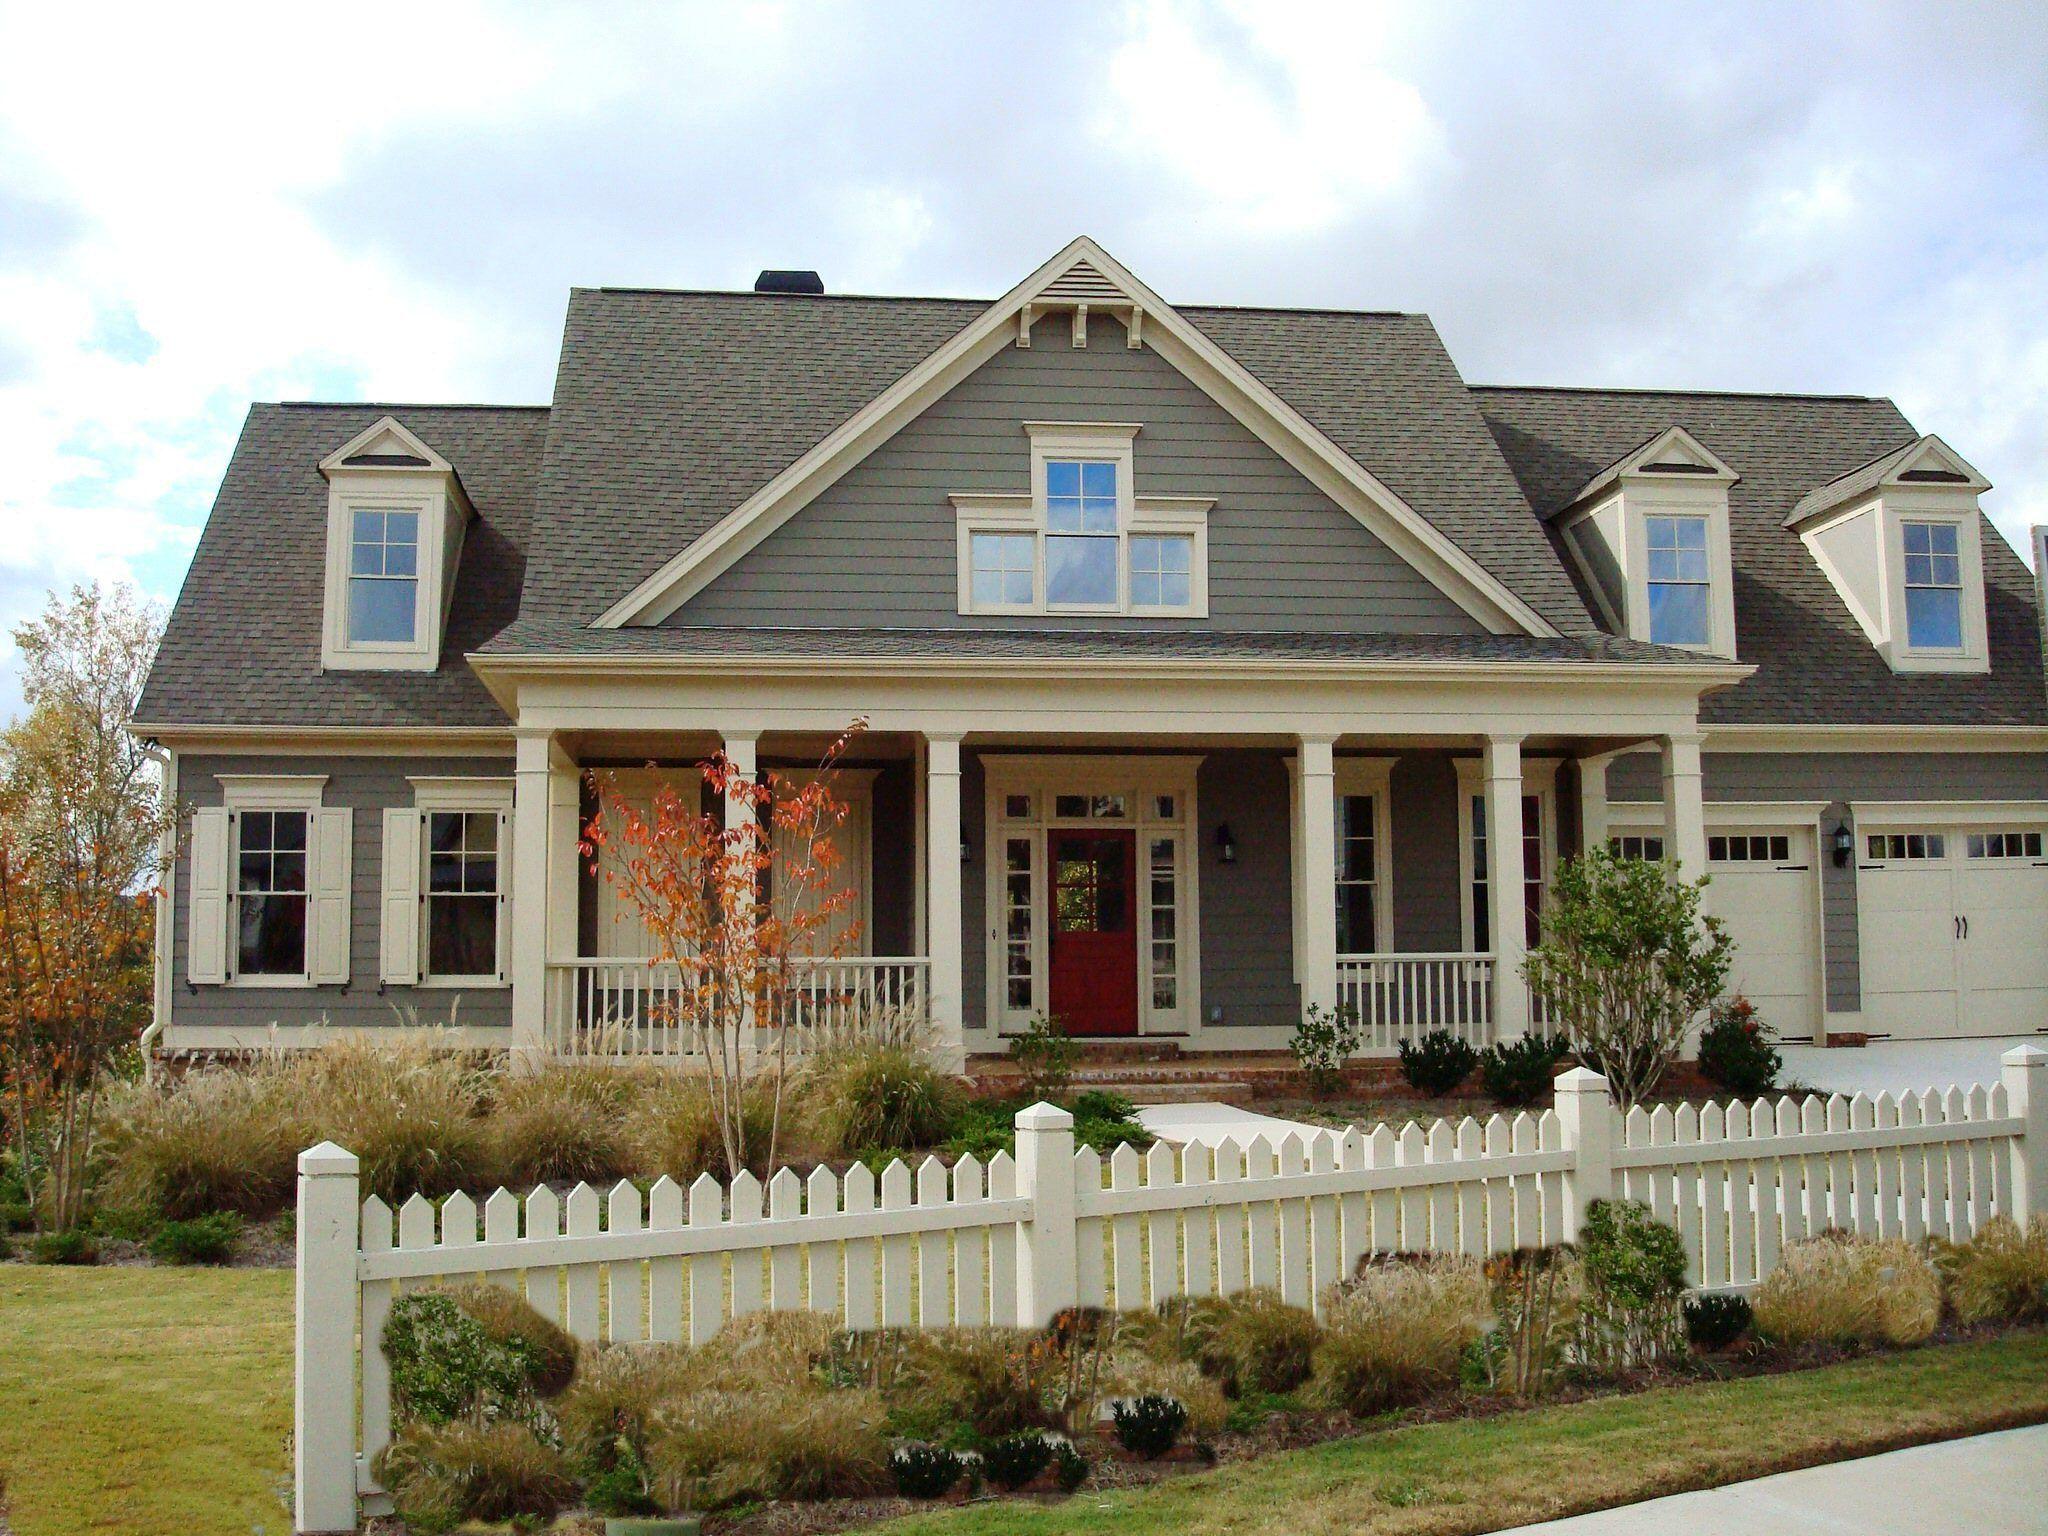 Top Modern Bungalow Design | Exterior colors, House colors and Bricks